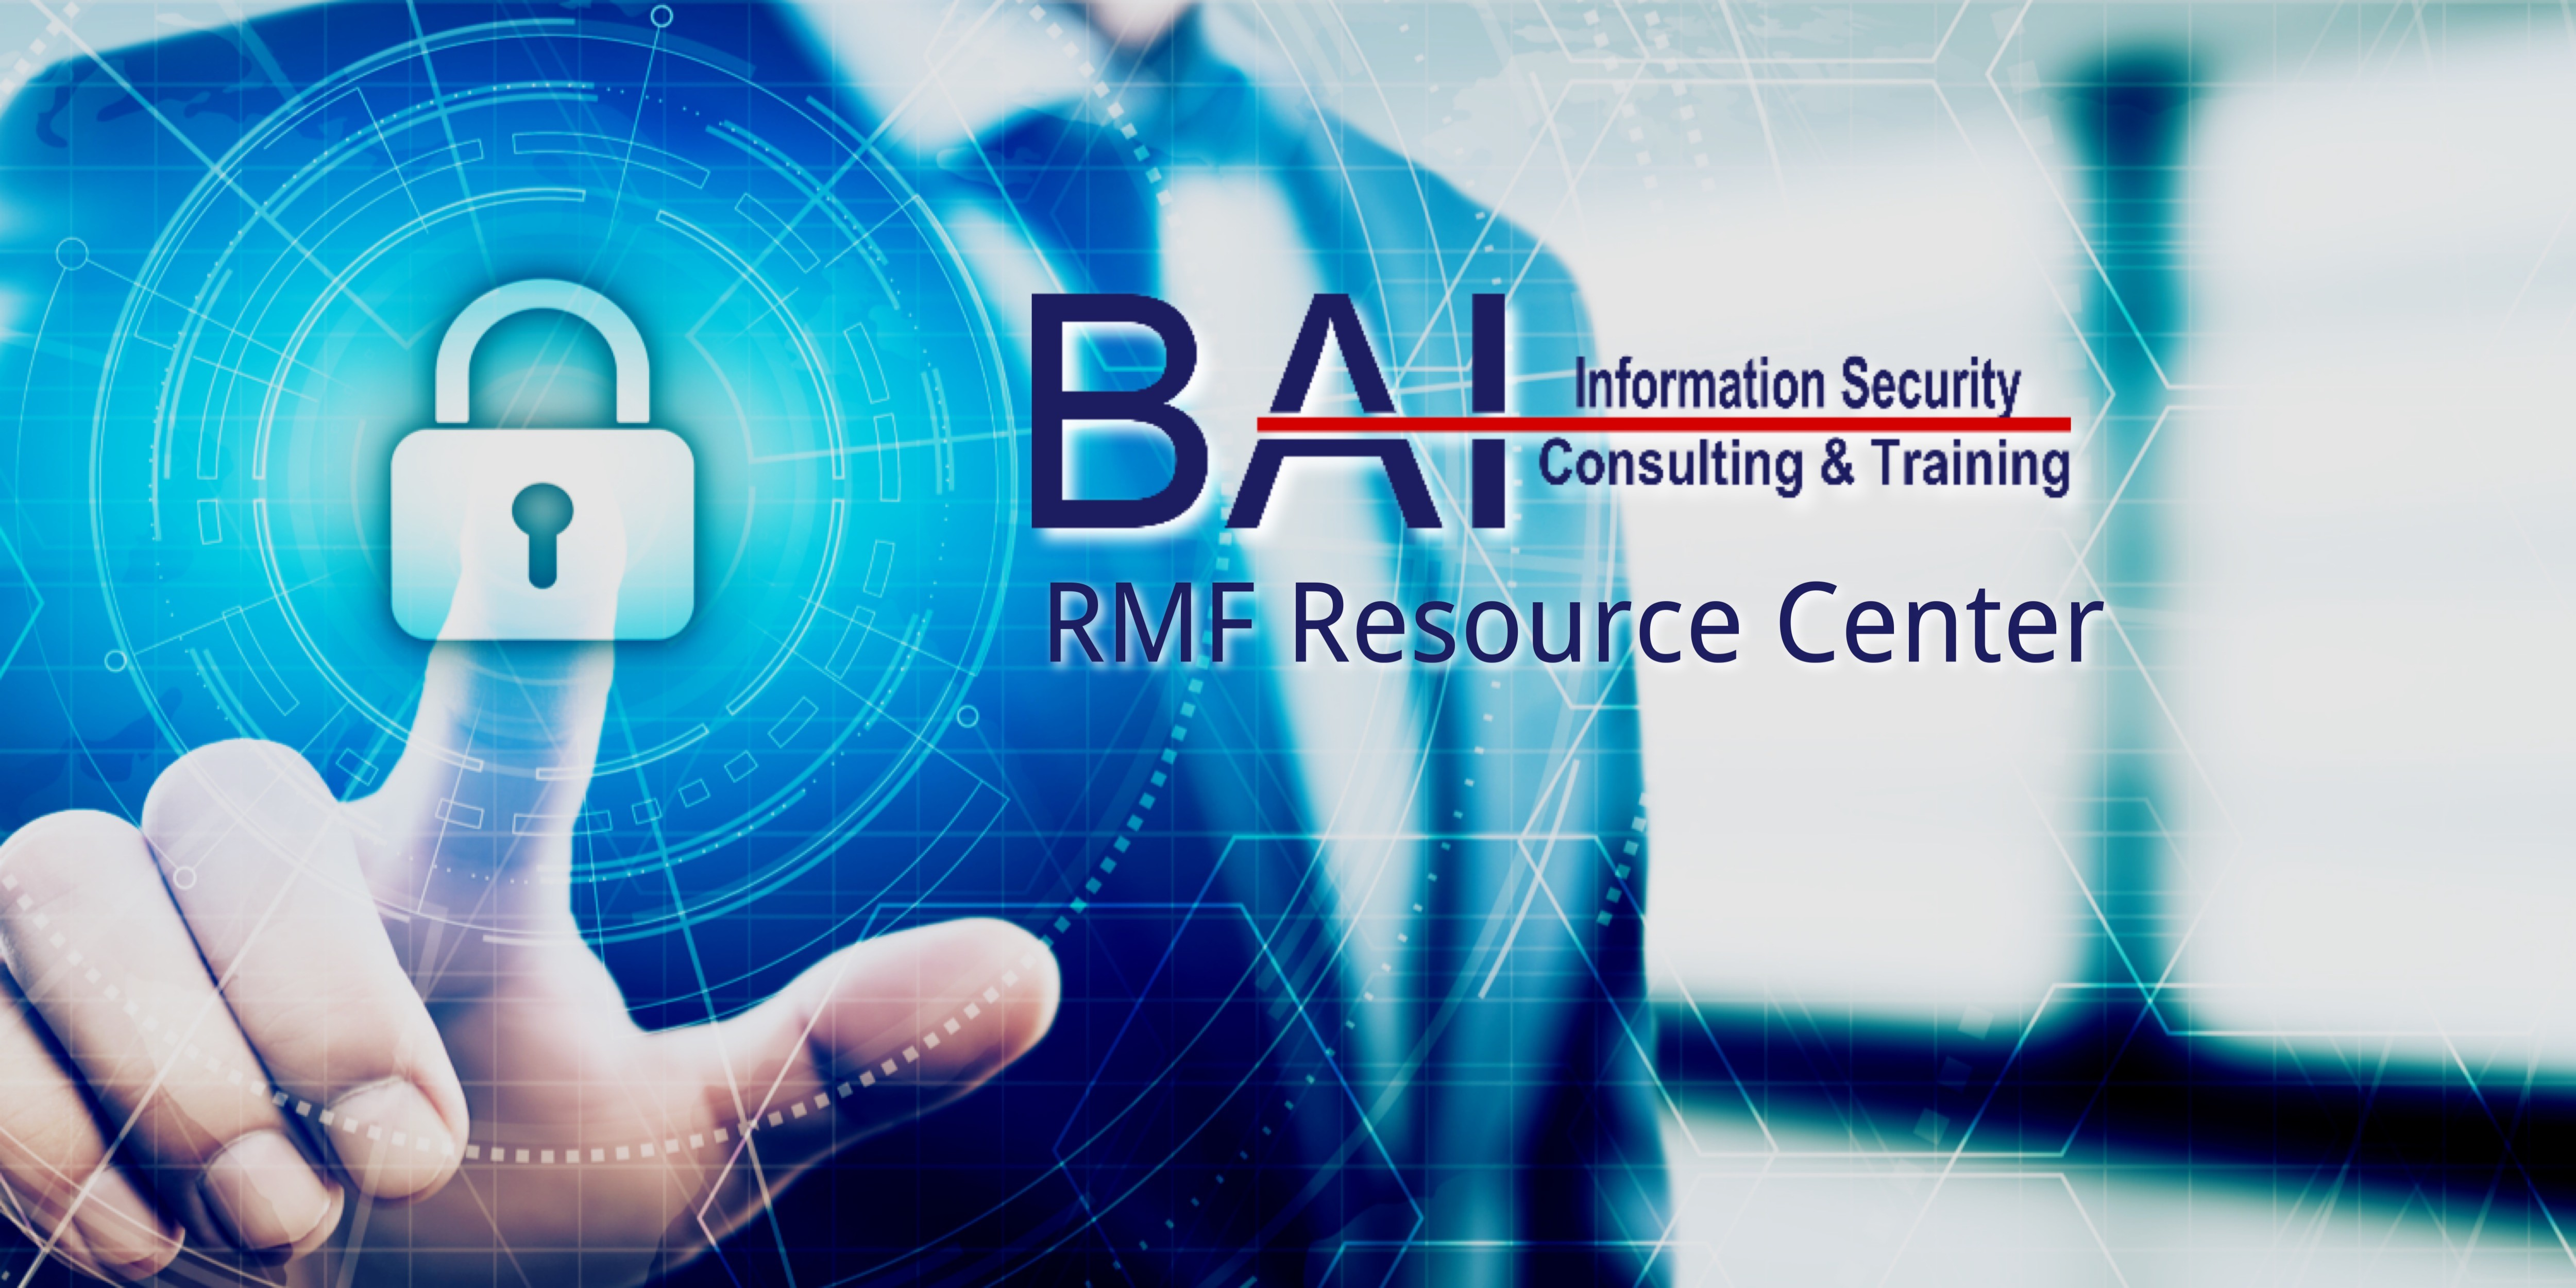 BAI Information Security | LinkedIn